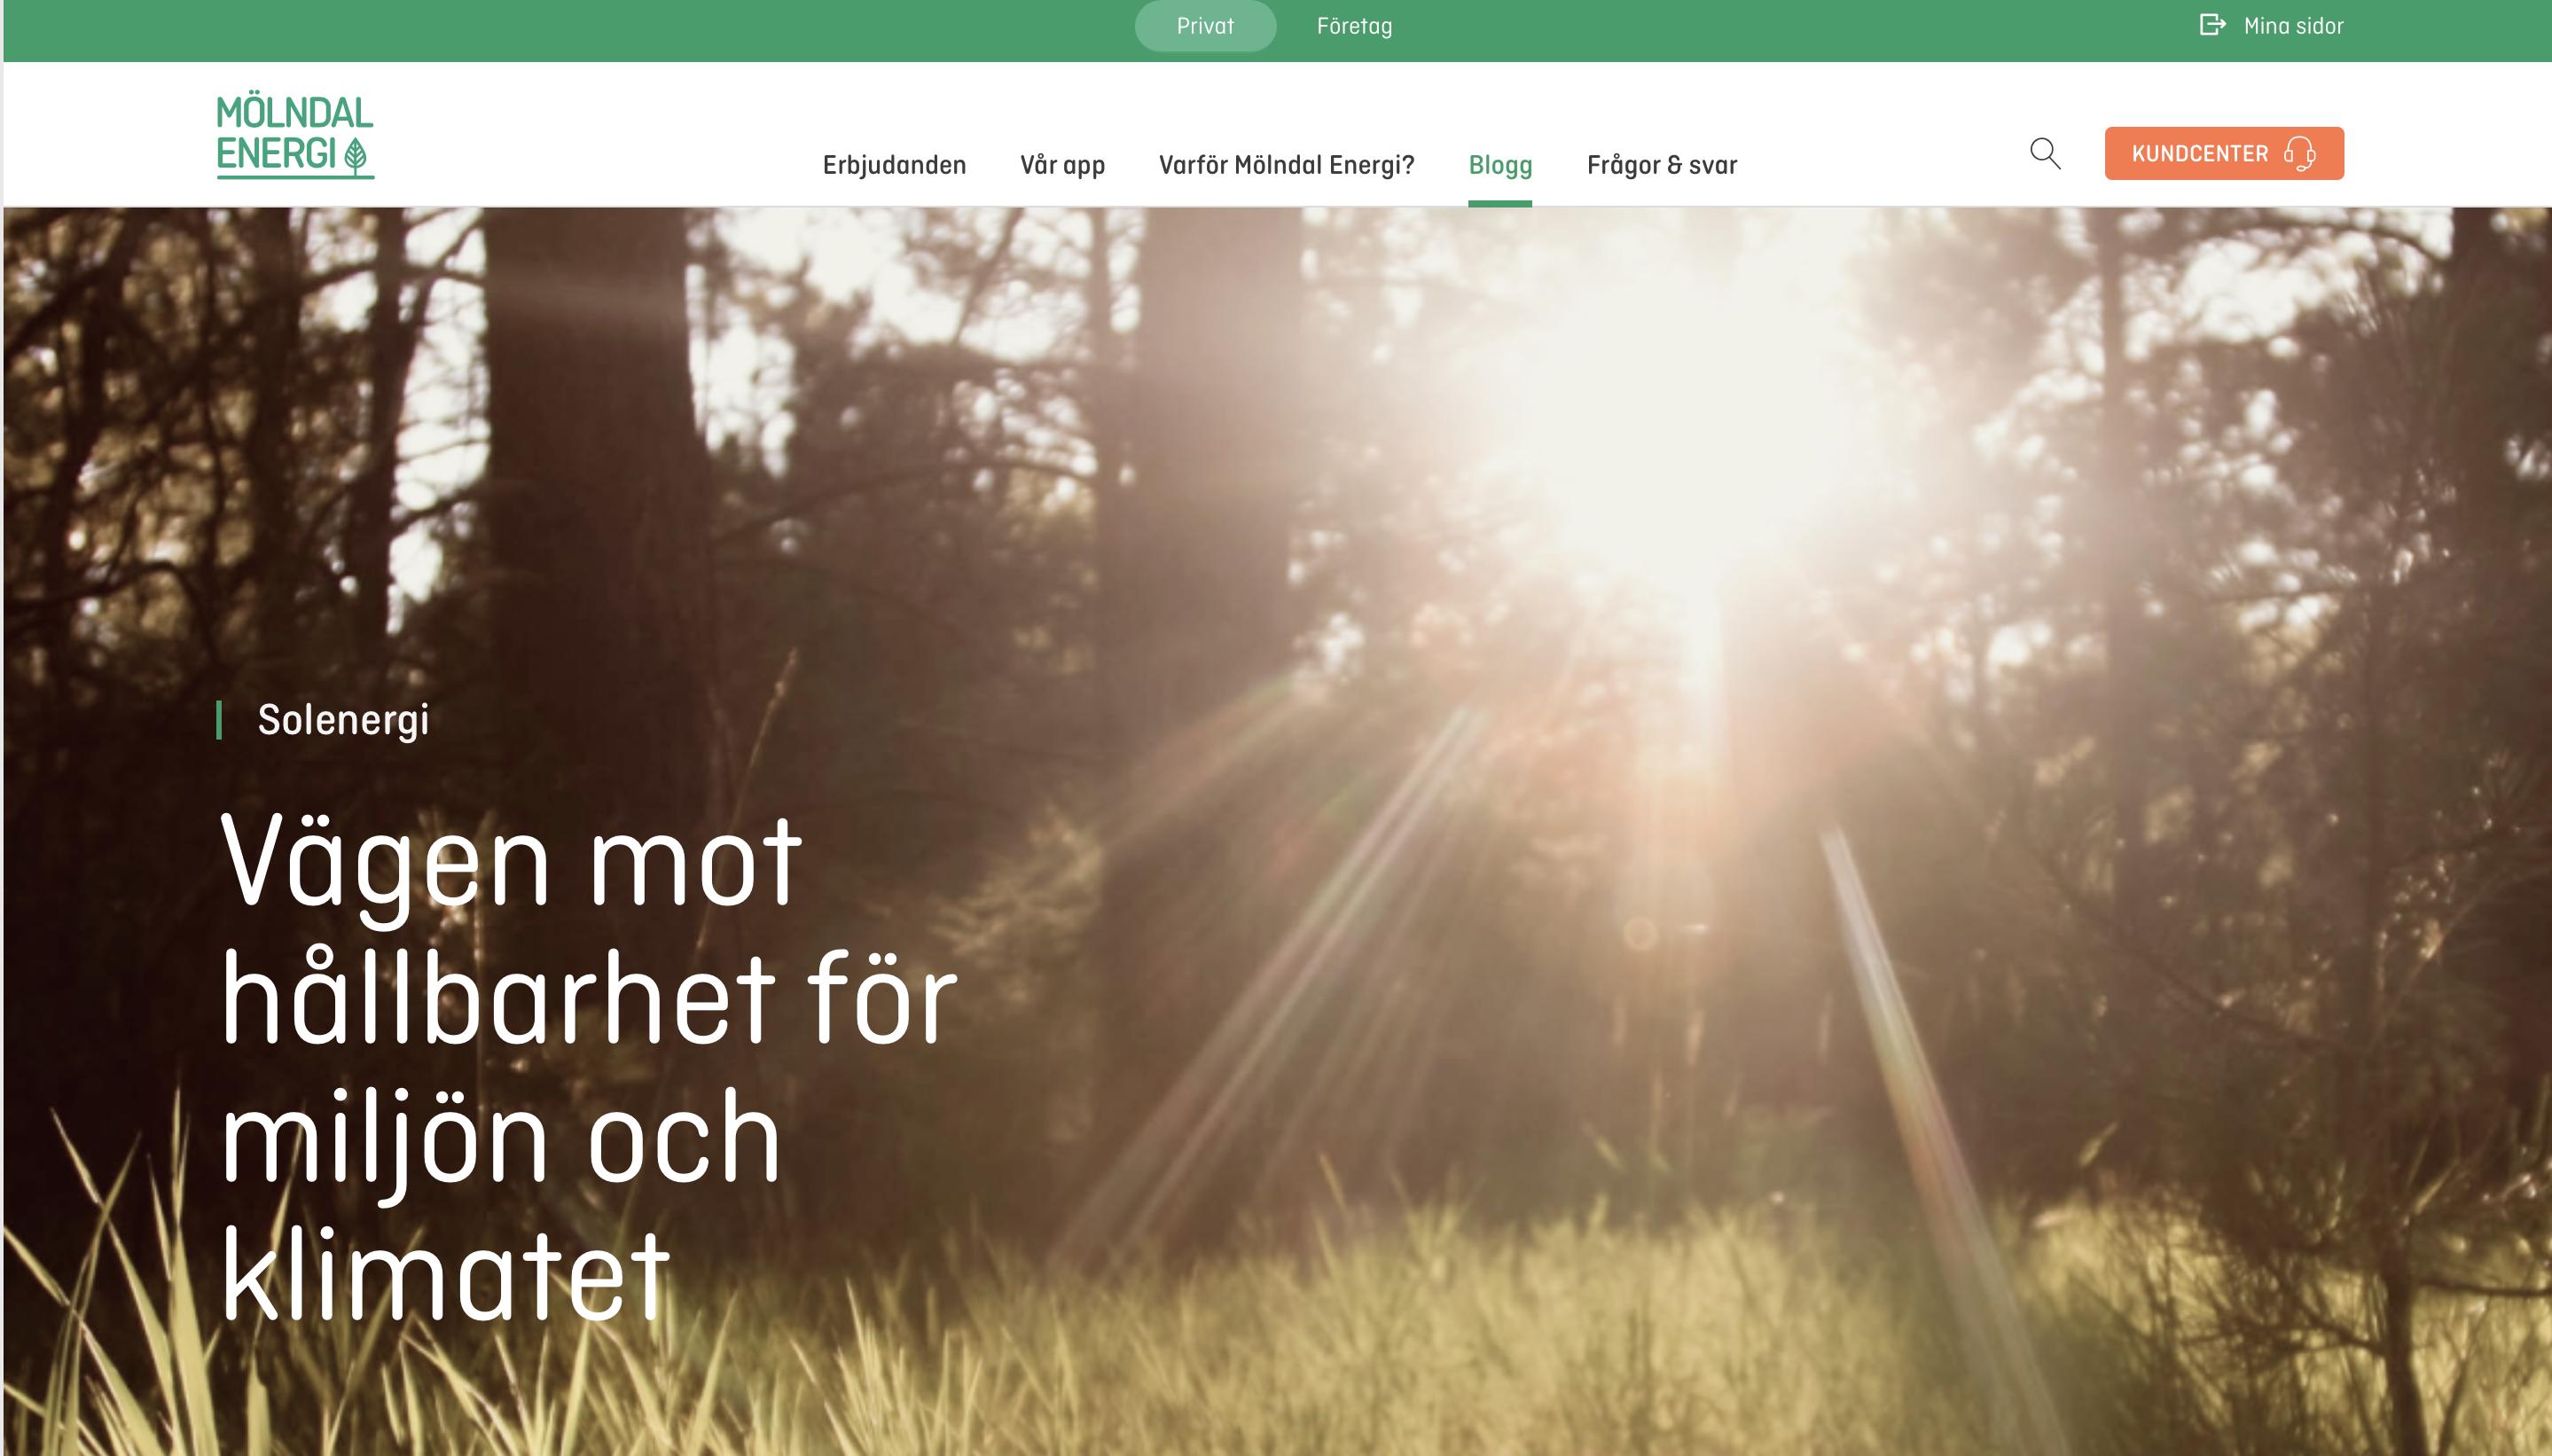 Mölndal_energi_solenergi